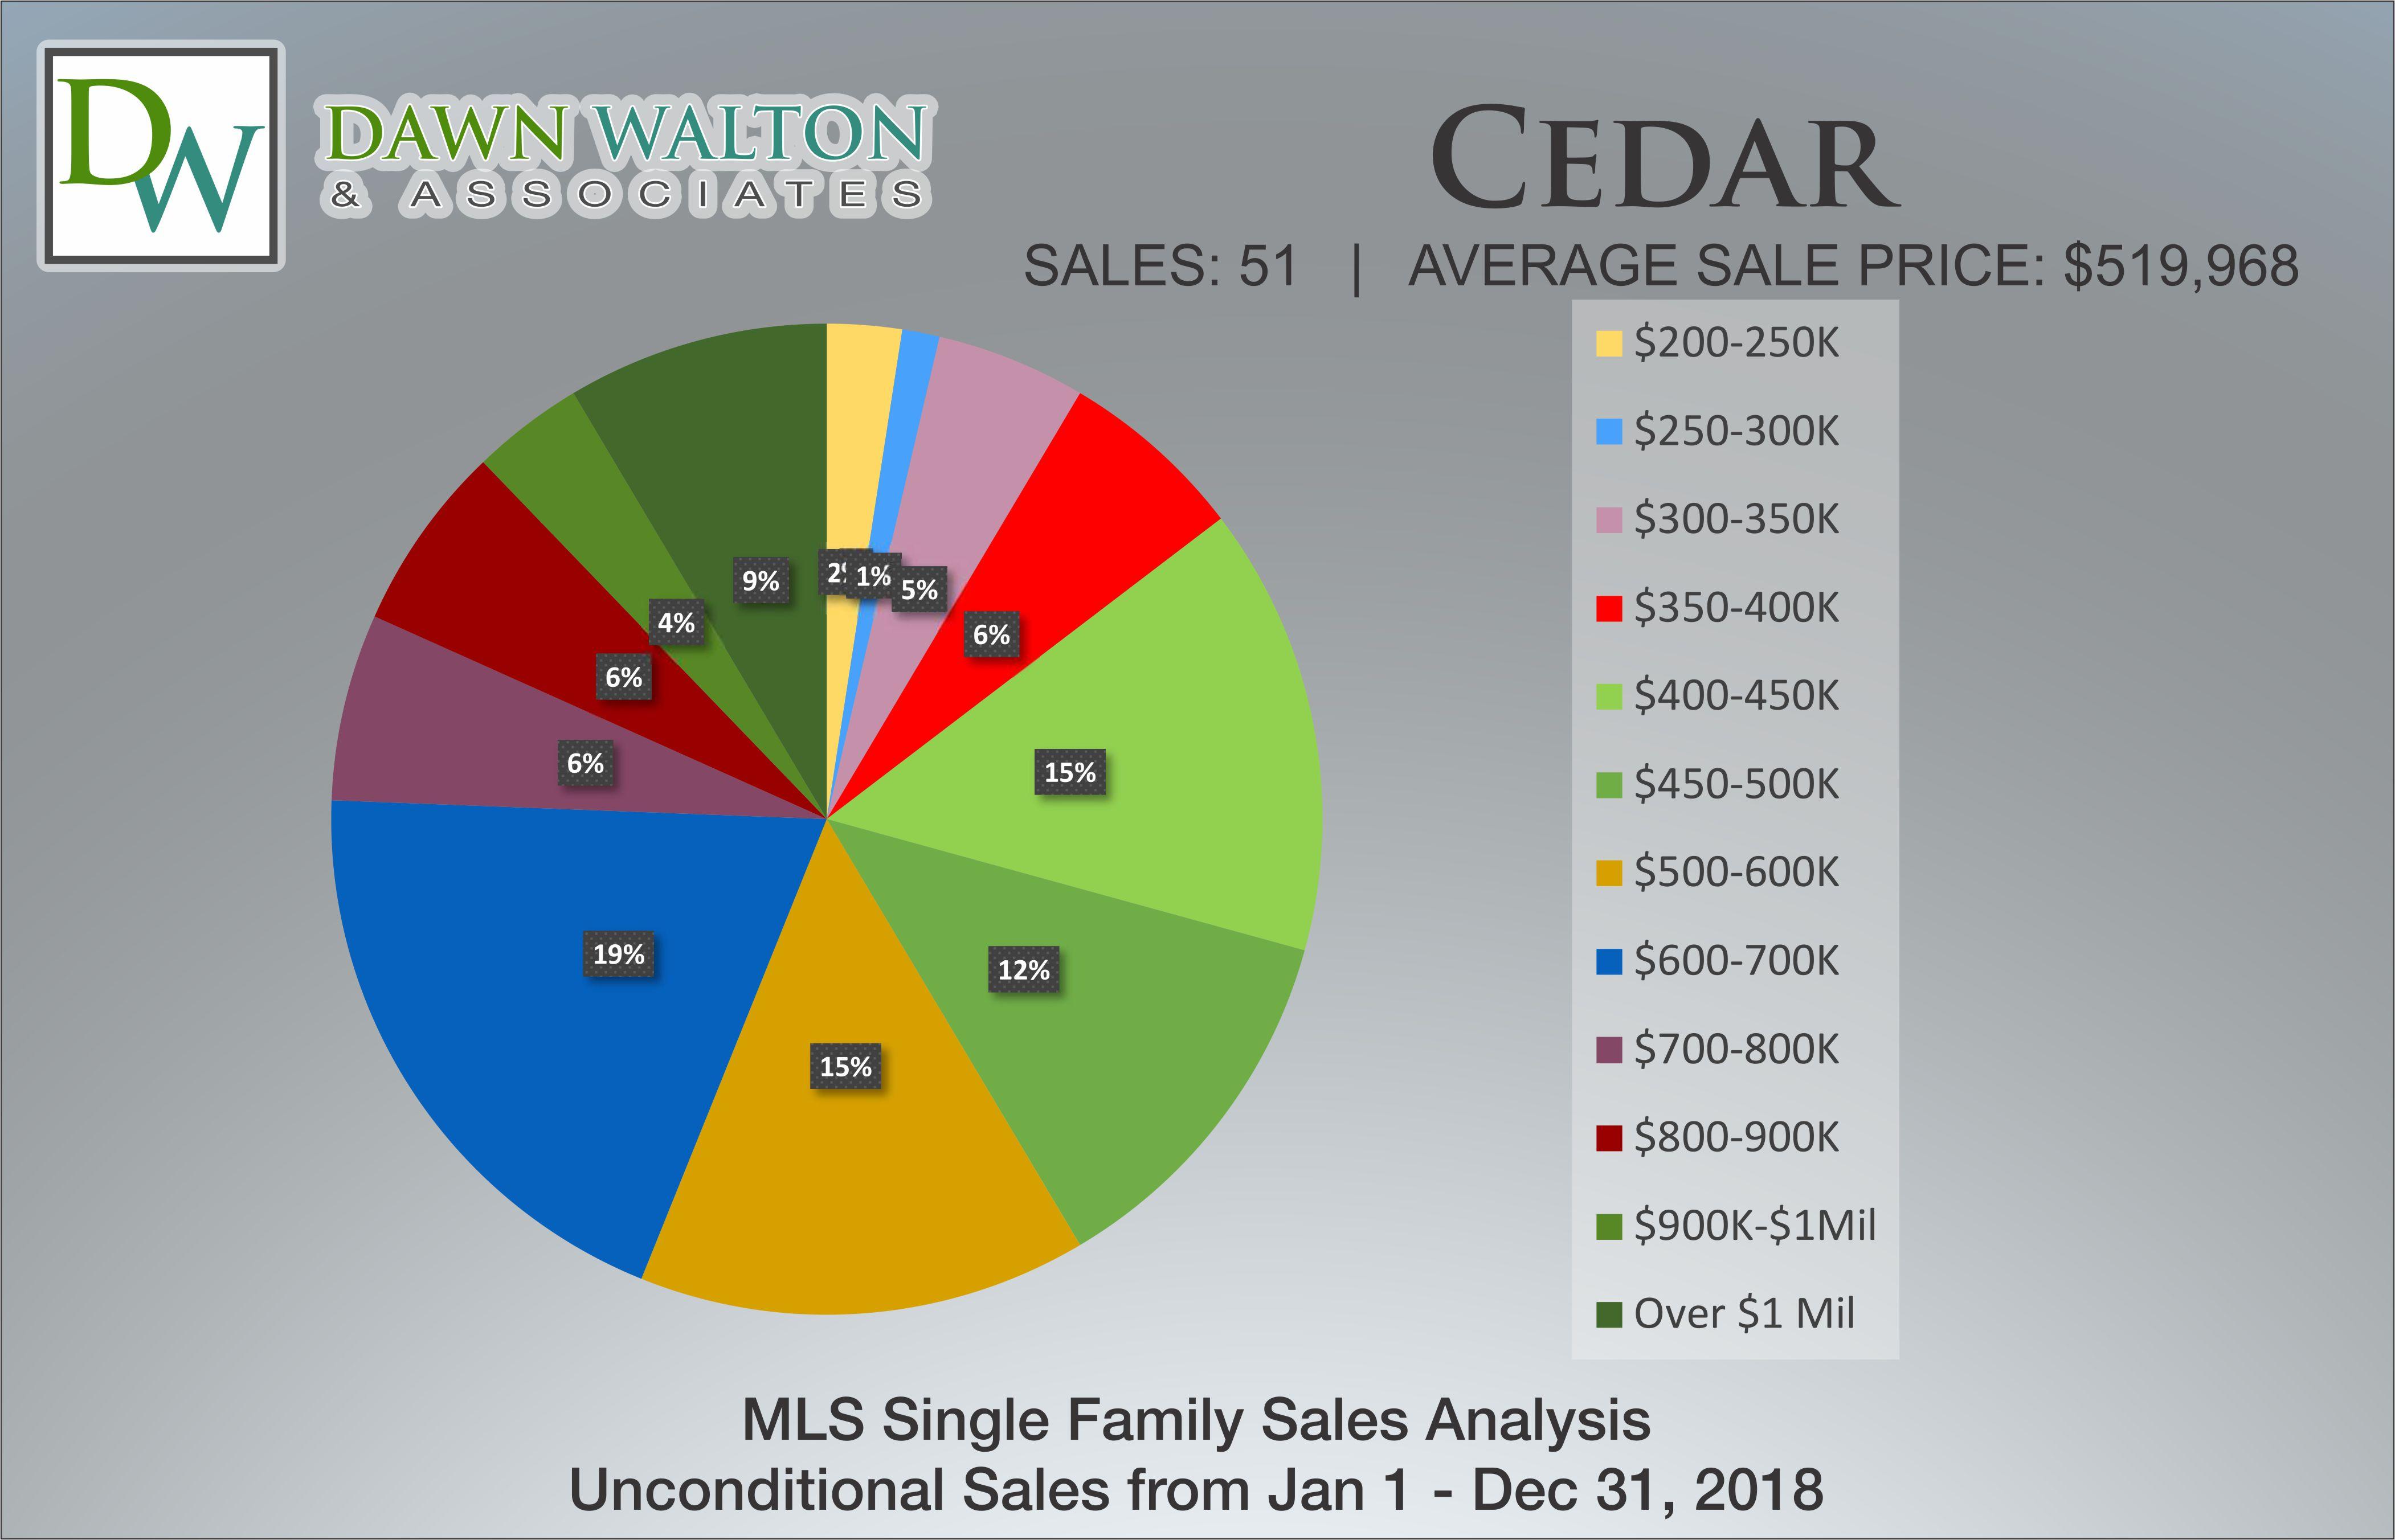 Cedar Real Estate Market Stats Price Percentage 2018 - Nanaimo Realtor